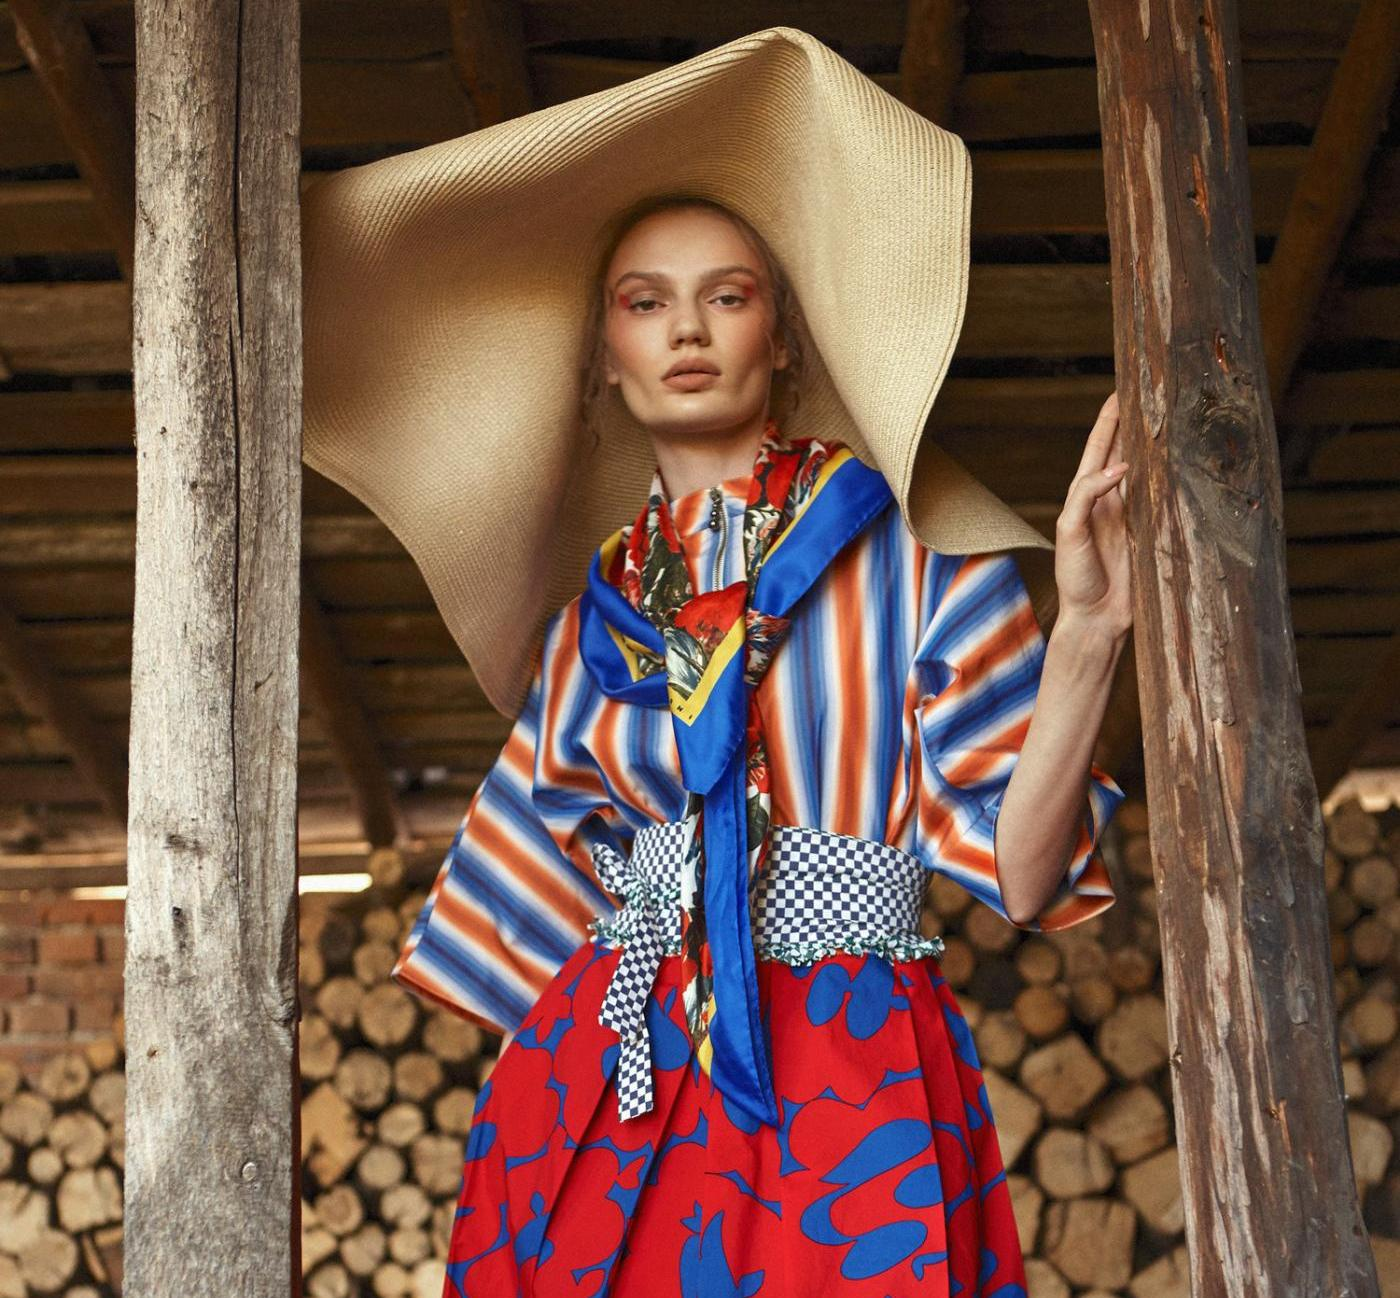 fashion photography dress by diliana florentin